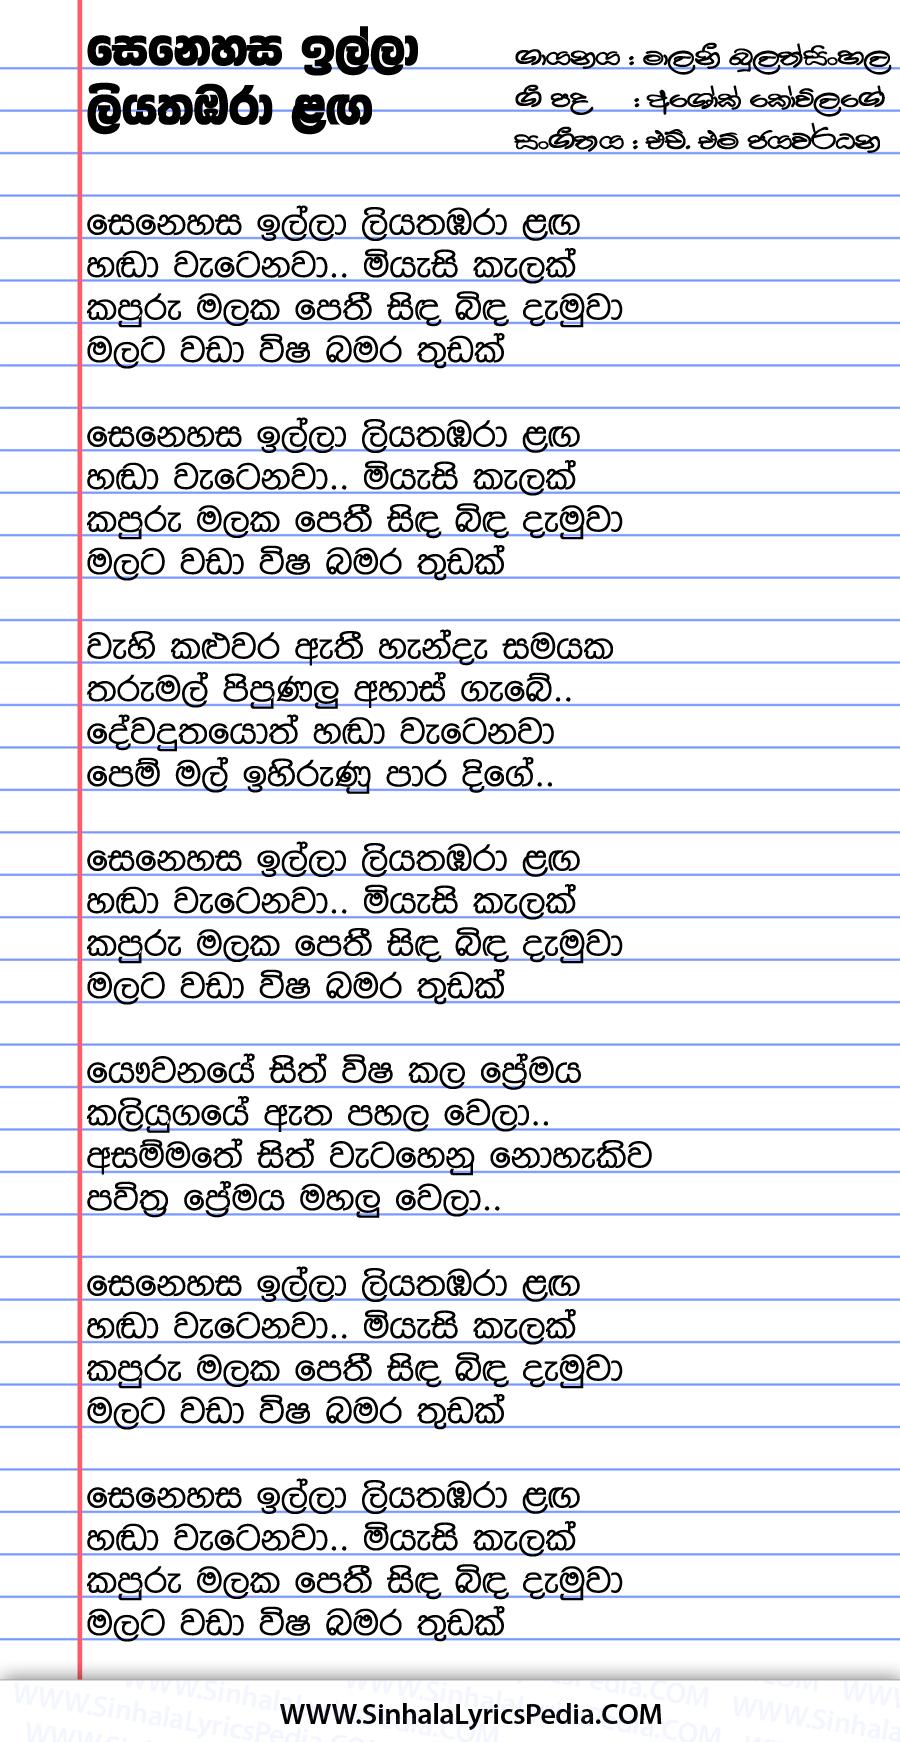 Senehasa Illa Liyathambara Langa Song Lyrics